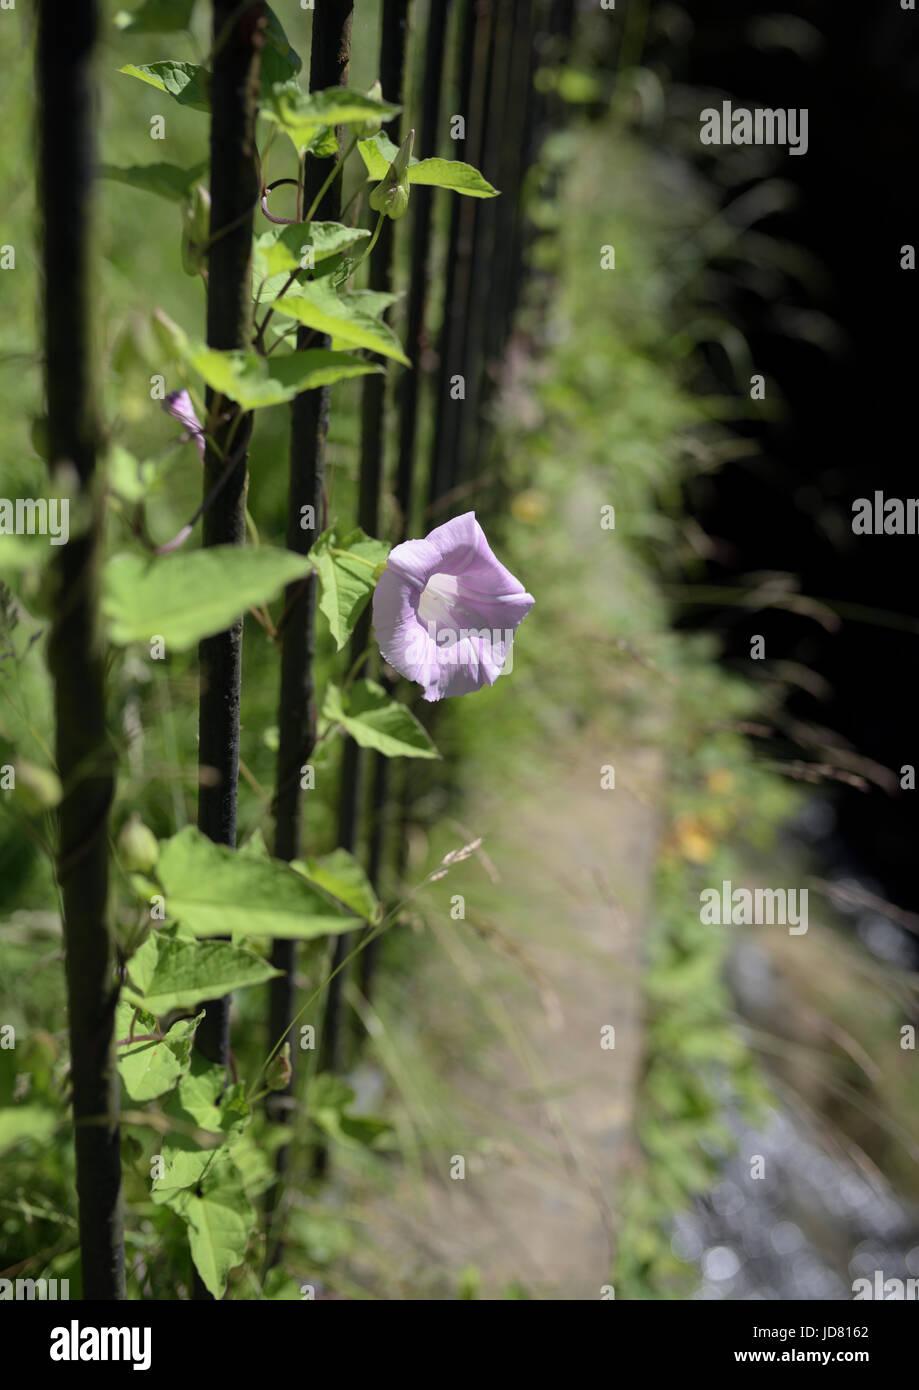 Field bindweed growing around iron railings - Stock Image